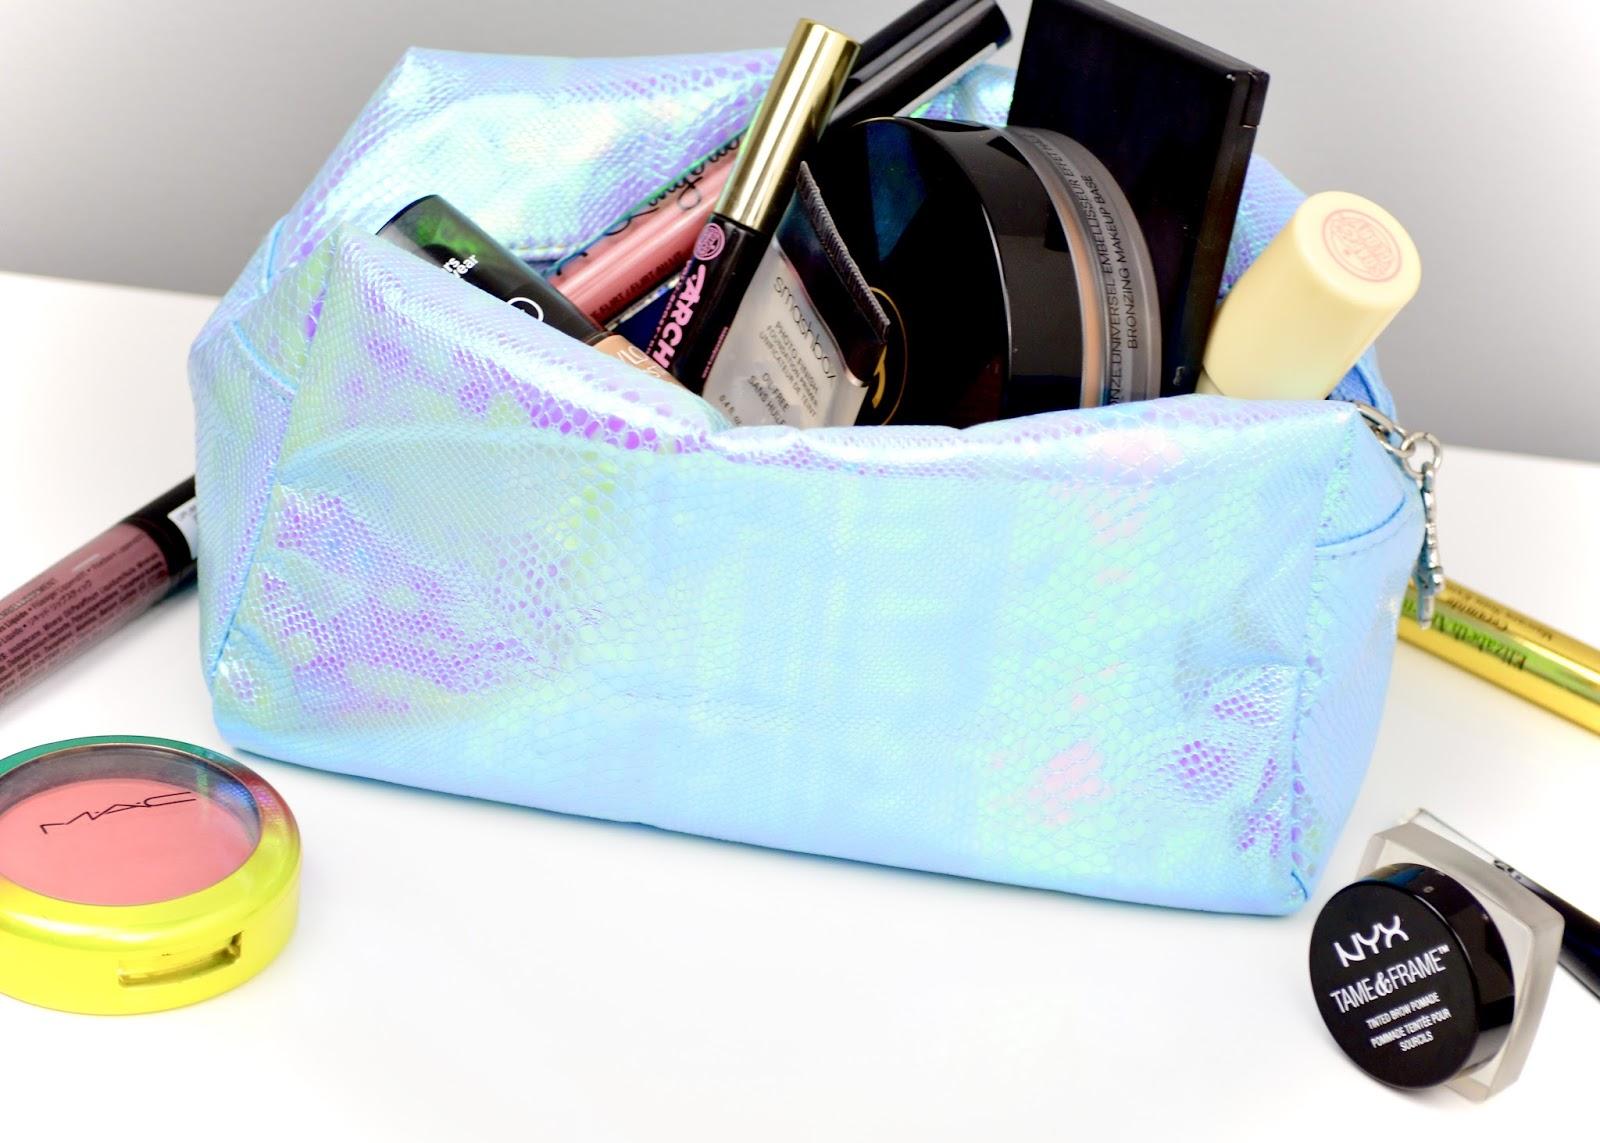 Makeup Makeup Bag, Lipstick, Nude Lip, Blush, Eyebrows, Brows, Everyday Makeup Bag, Makeup Look, Primark Makeup Bag, NYX, Mac, Velvet Teddy, Lancome, Chanel